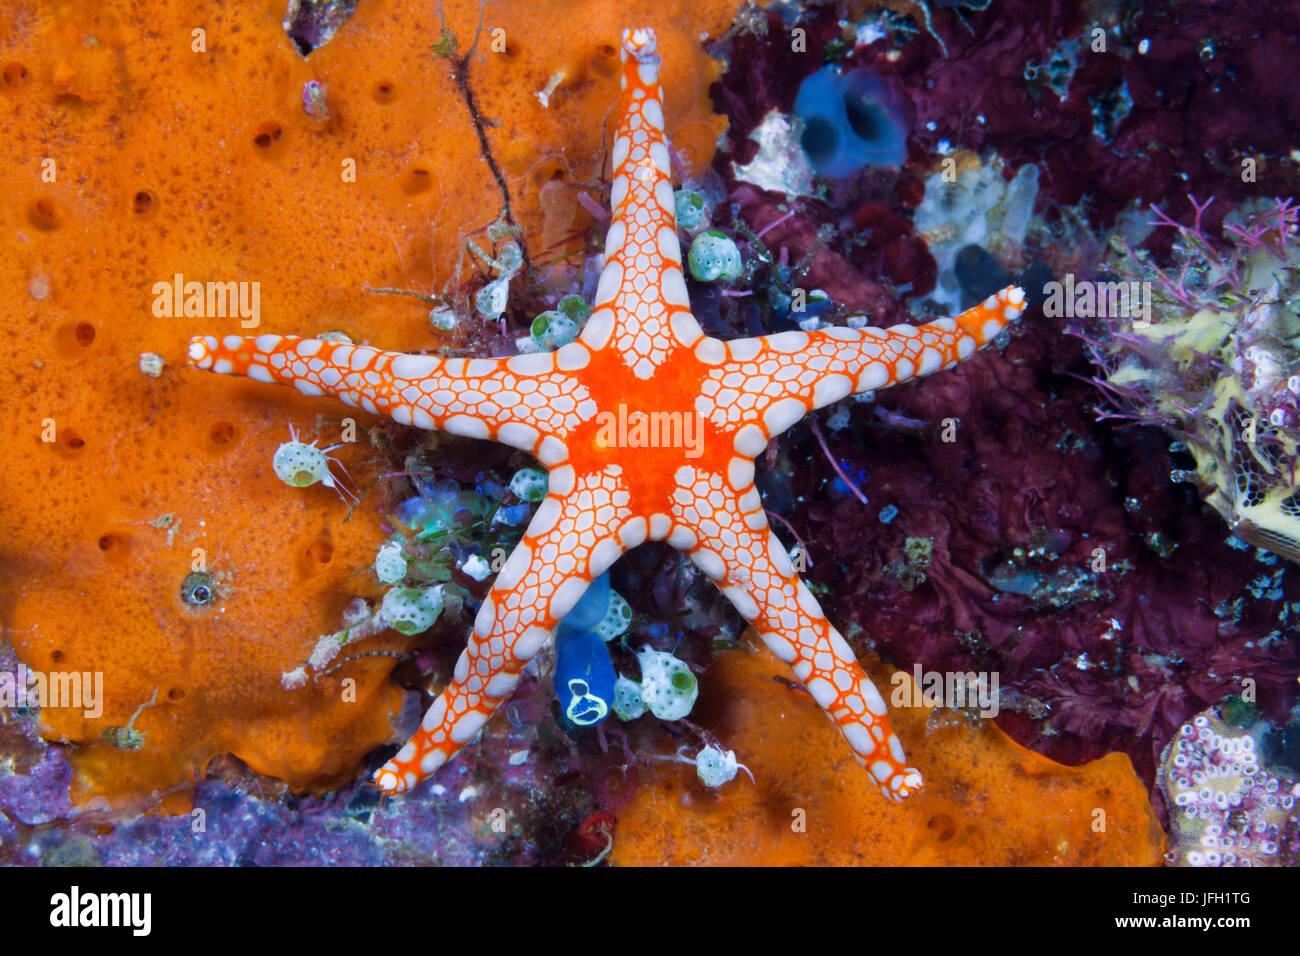 Red mesh starfish, Fromia monilis, ambon, the Moluccas, Indonesia Stock Photo